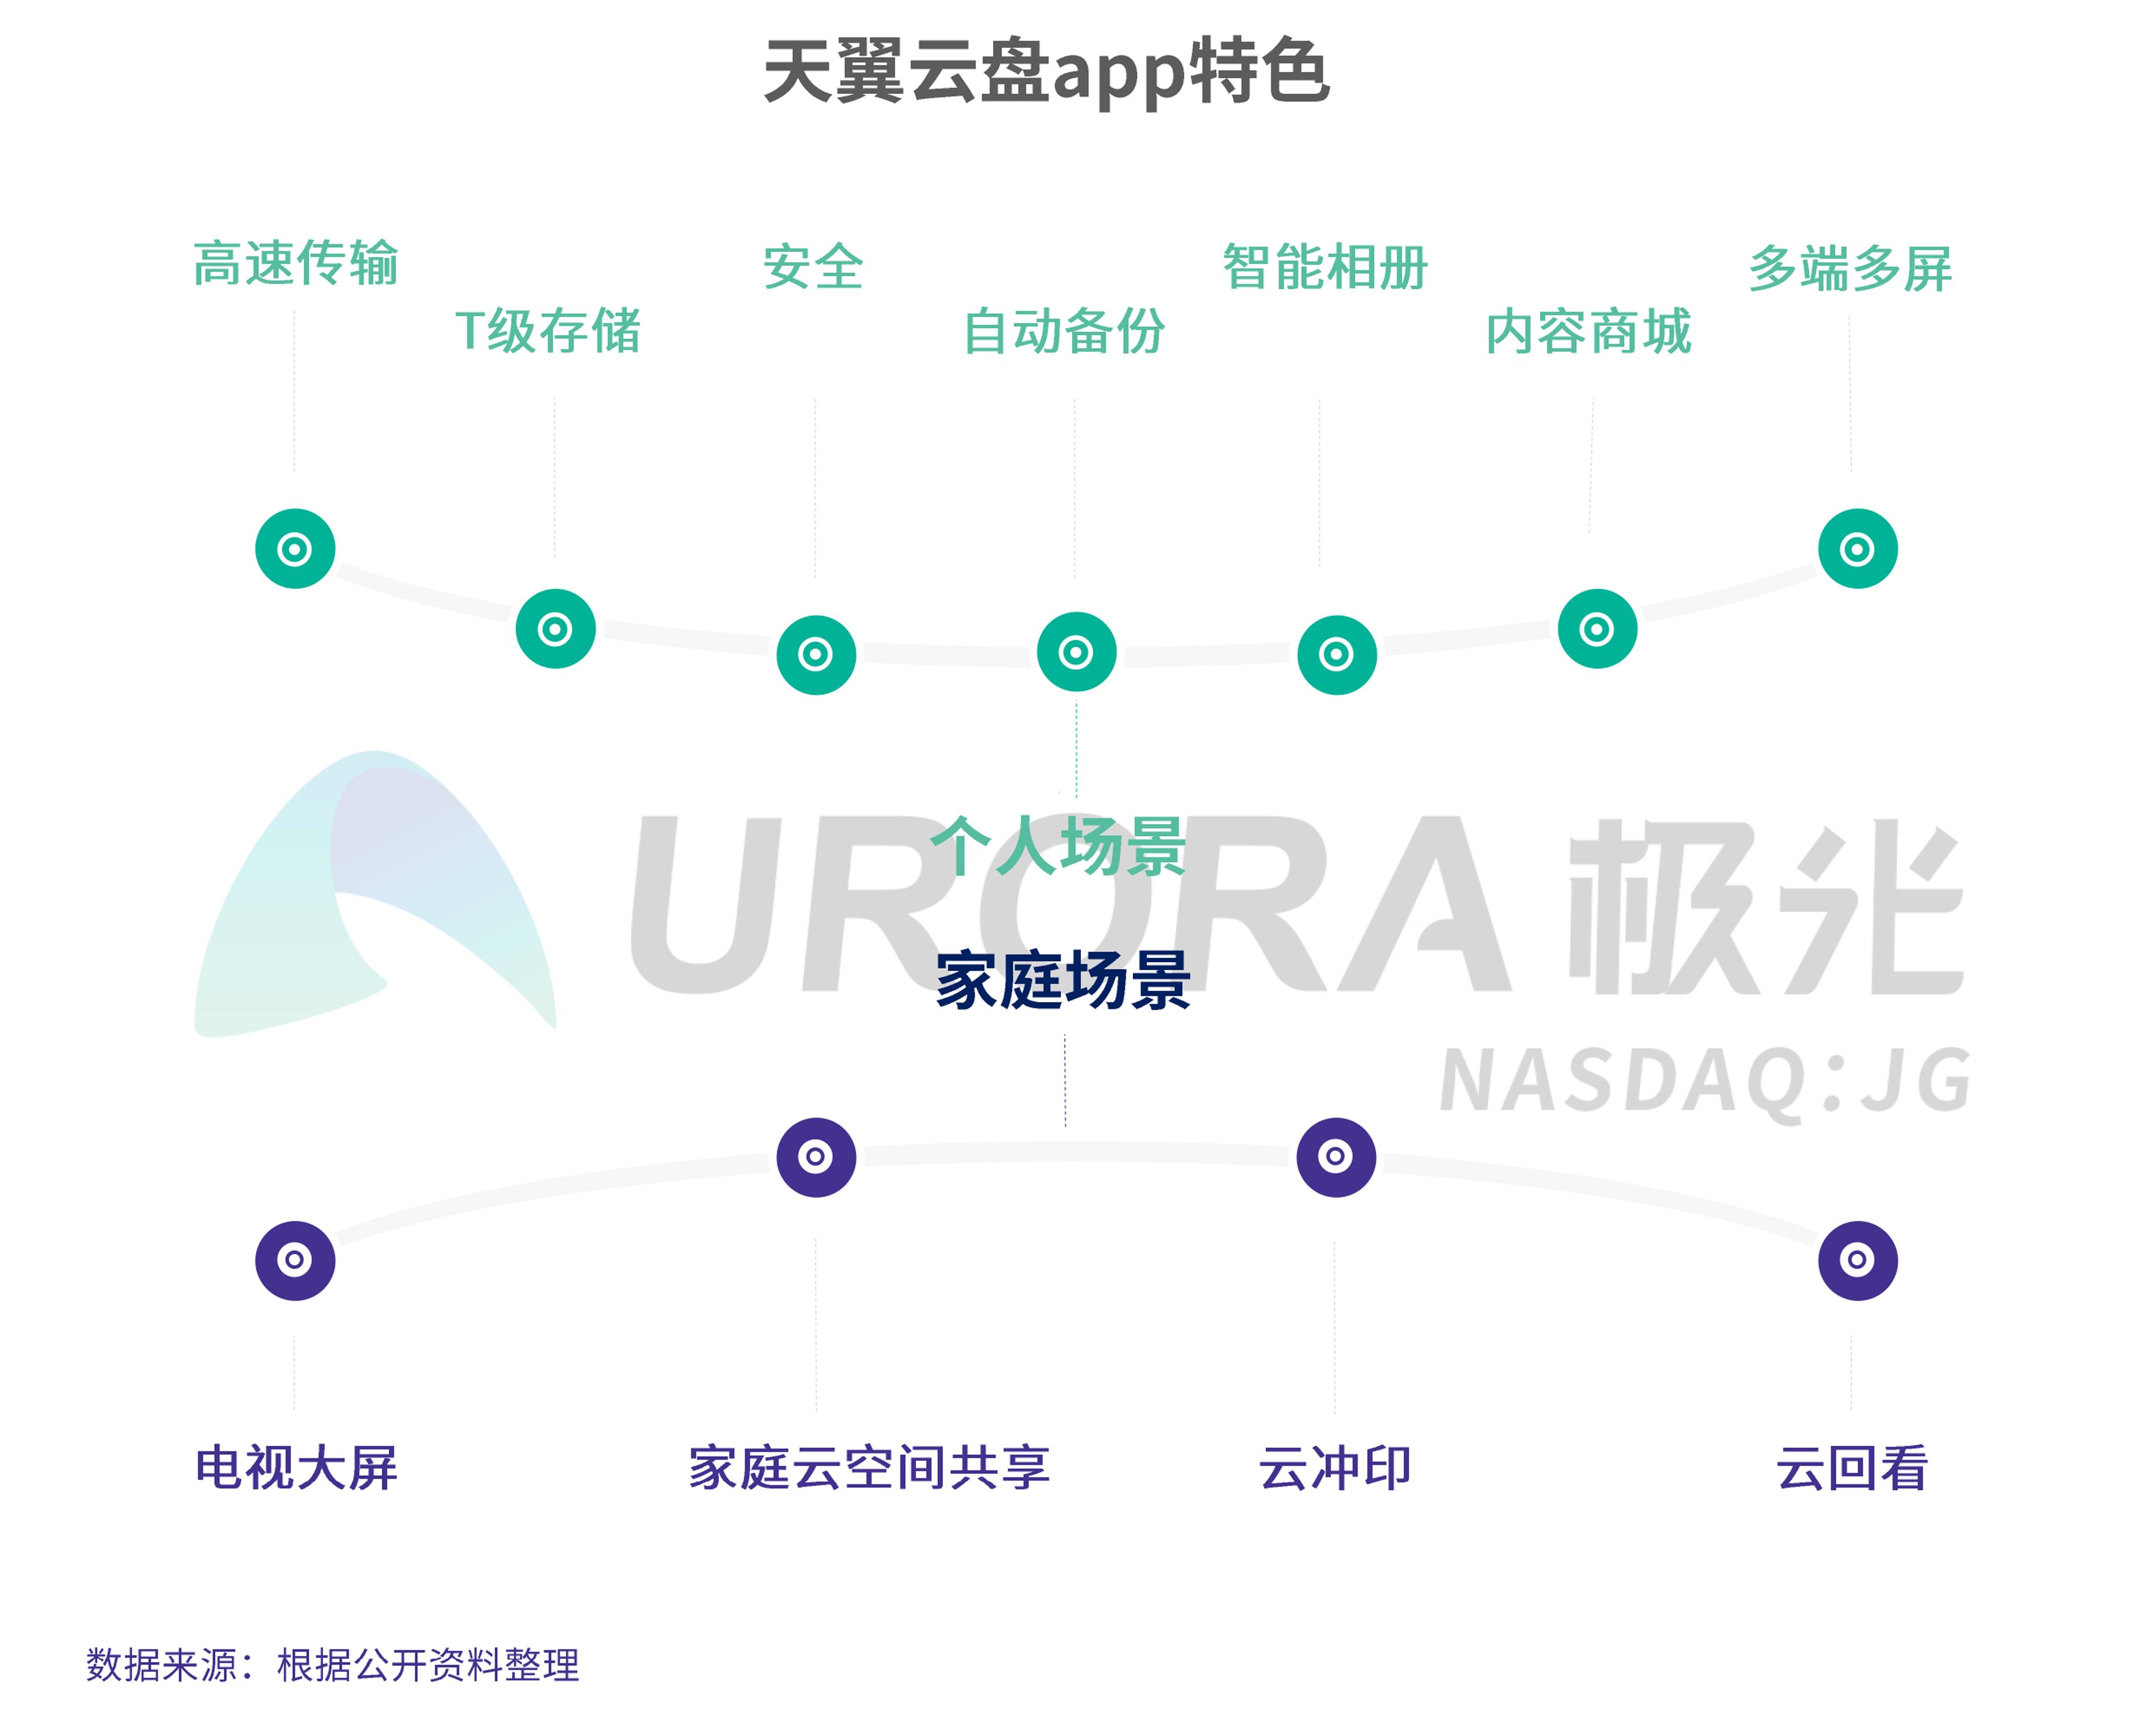 JIGUANG-个人网盘行业研究报告-final---切图版2-27.png